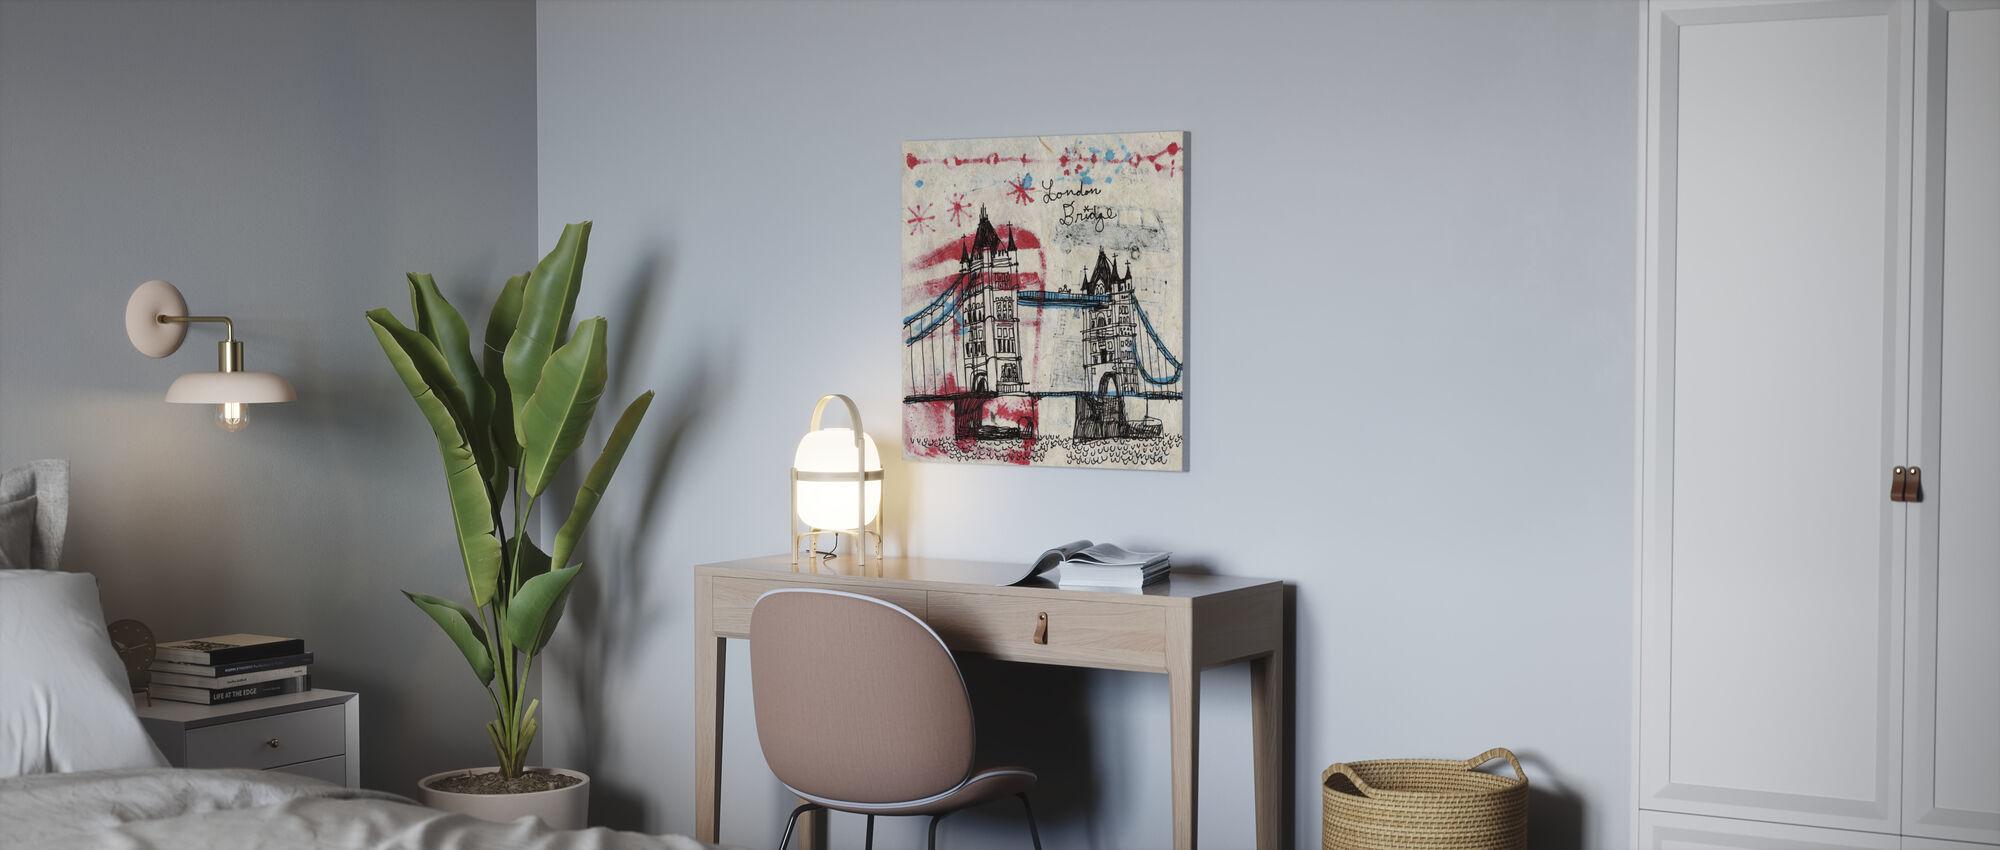 Tower Bridge - Canvas print - Office